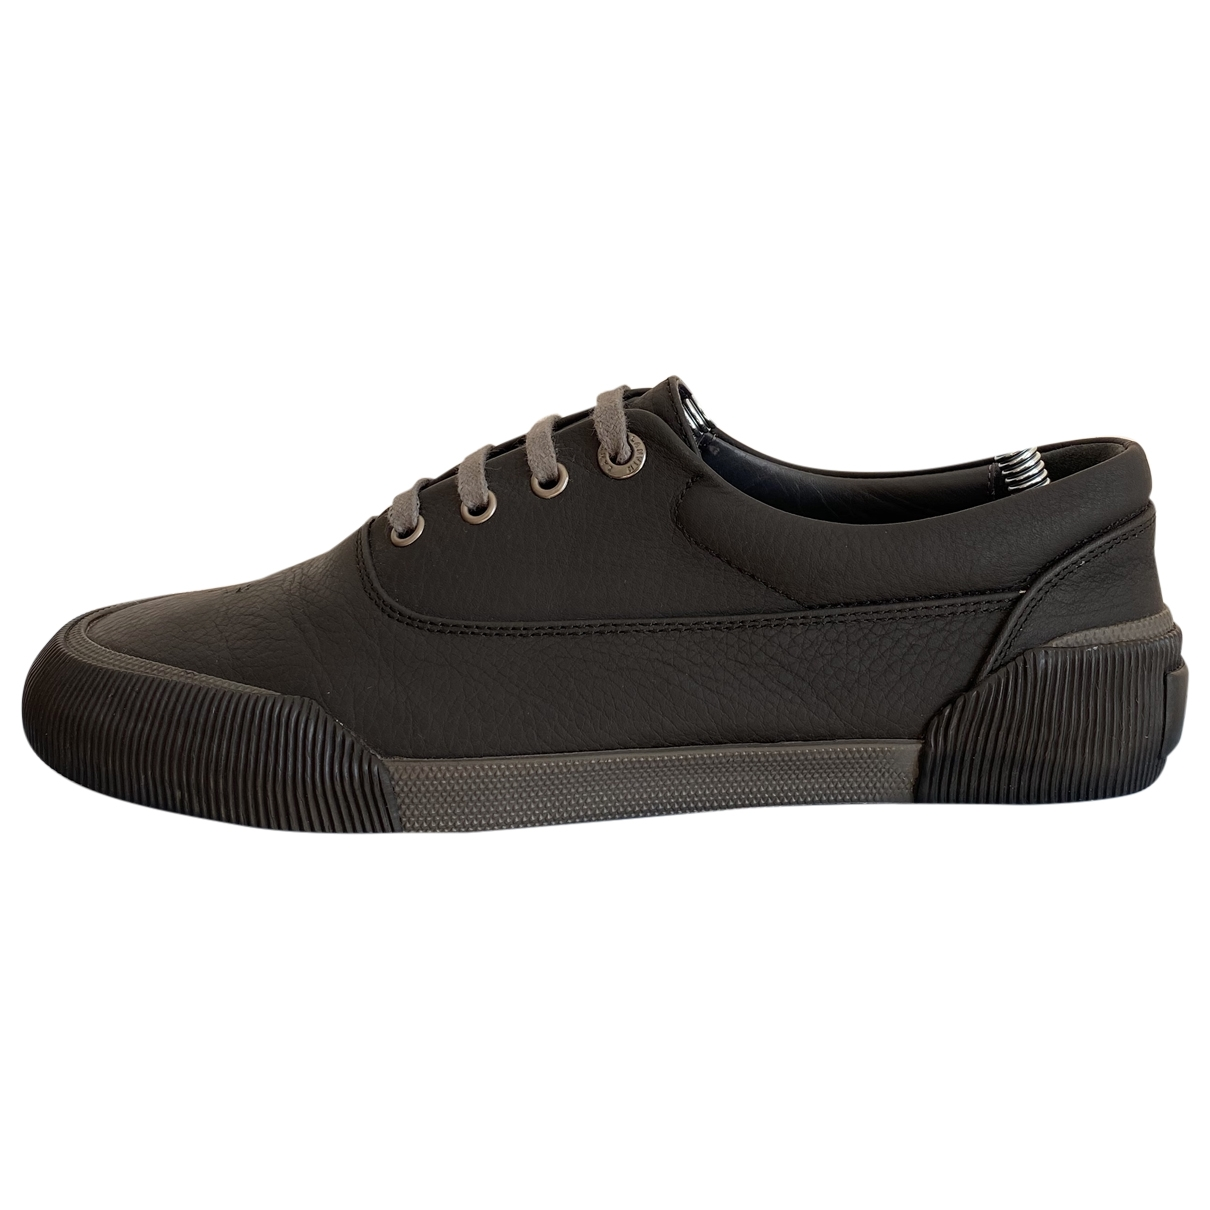 Lanvin \N Sneakers in  Anthrazit Leder